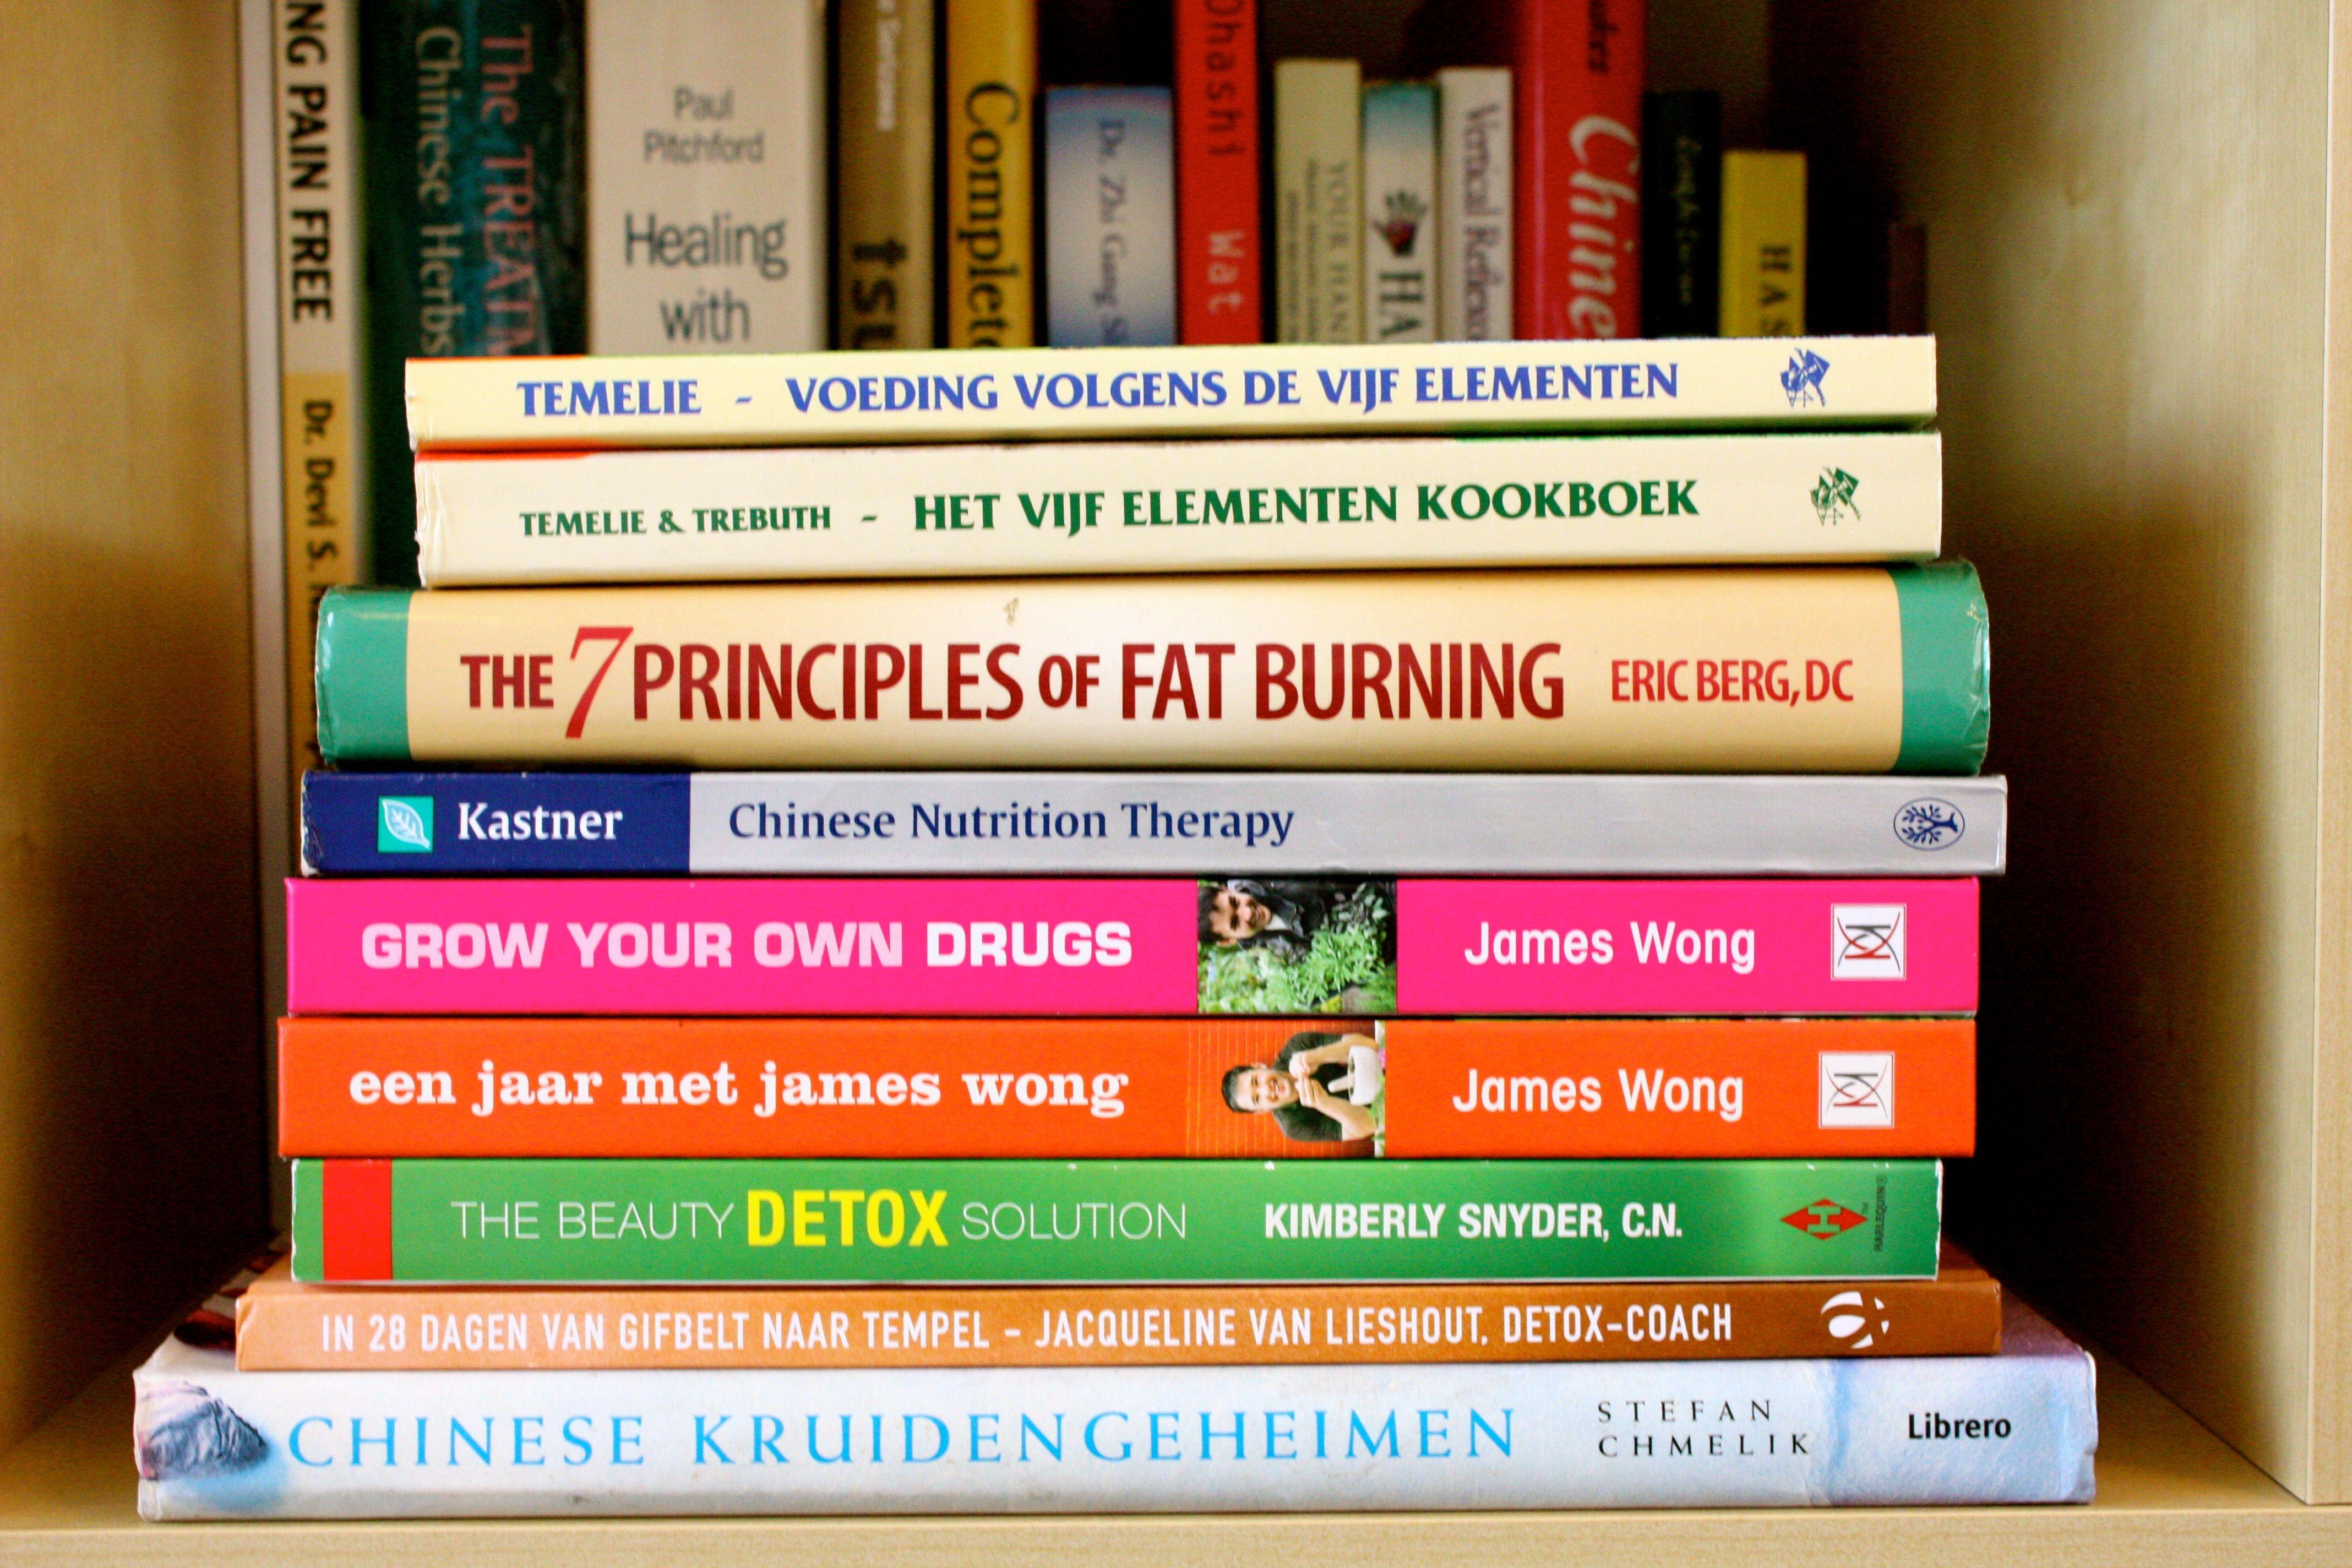 Acupunctuur Praktijk Tilburg boeken